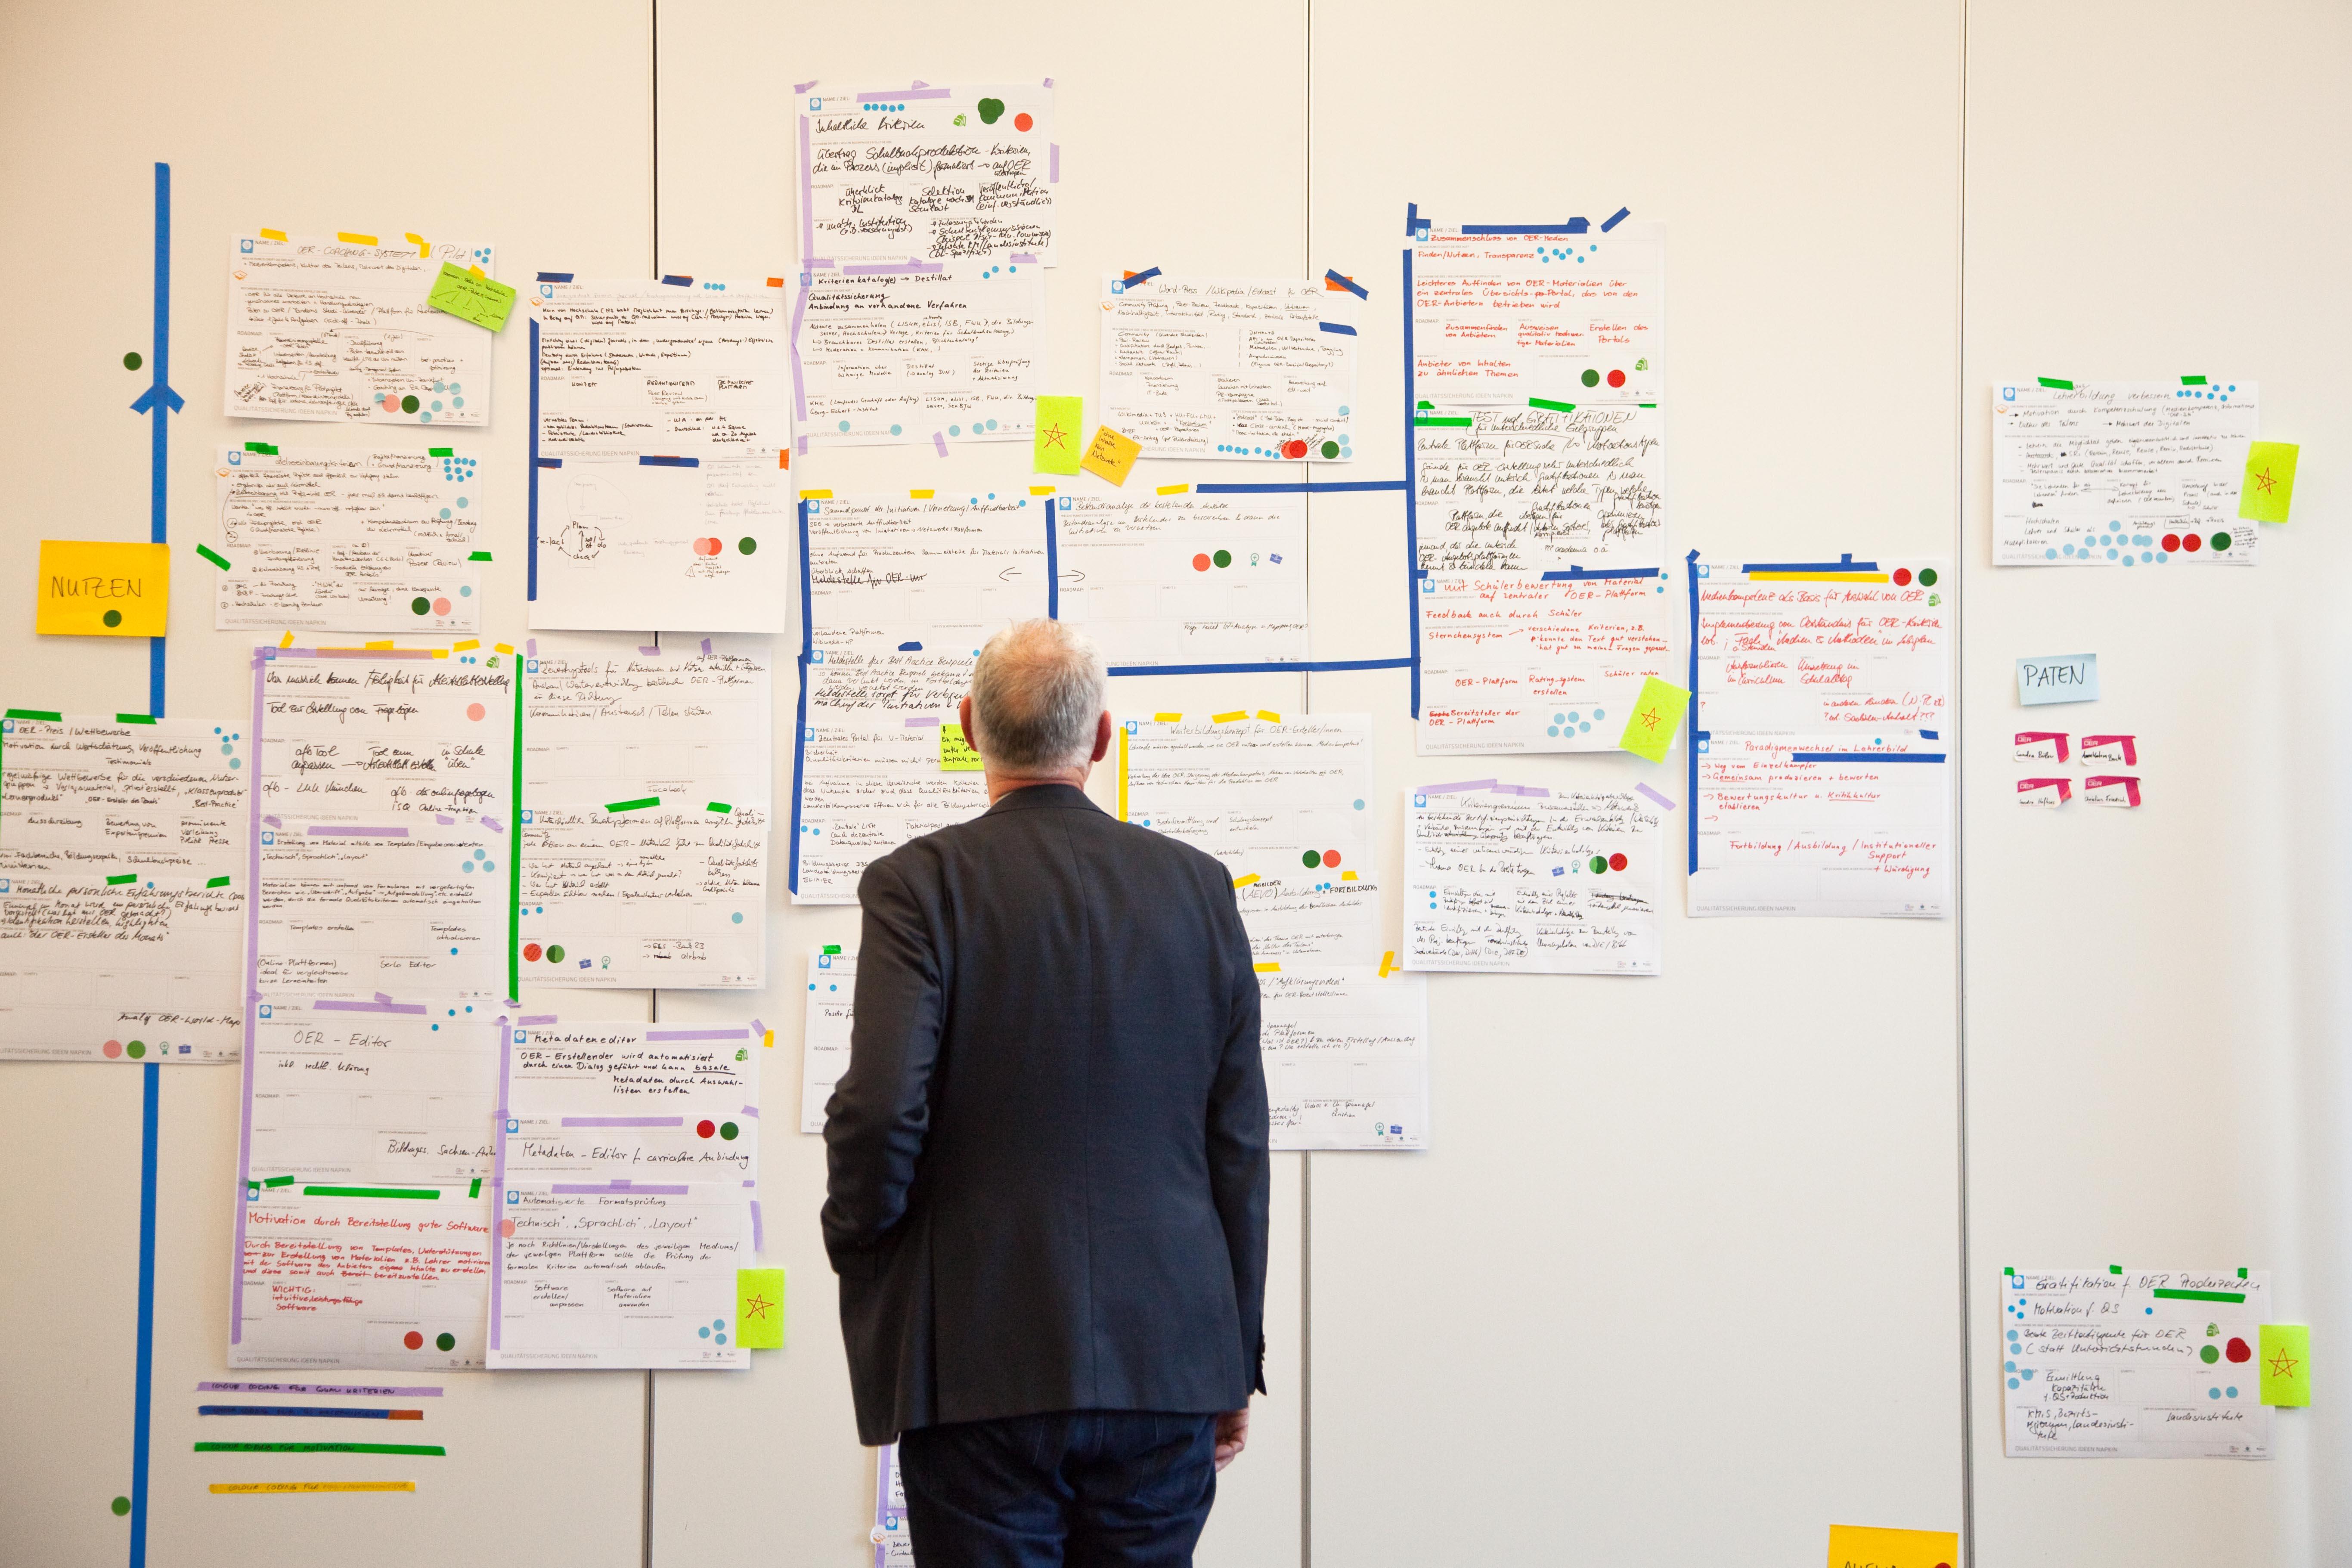 File:Mapping OER Workshop Qualitätssicherung 103.jpg - Wikimedia Commons